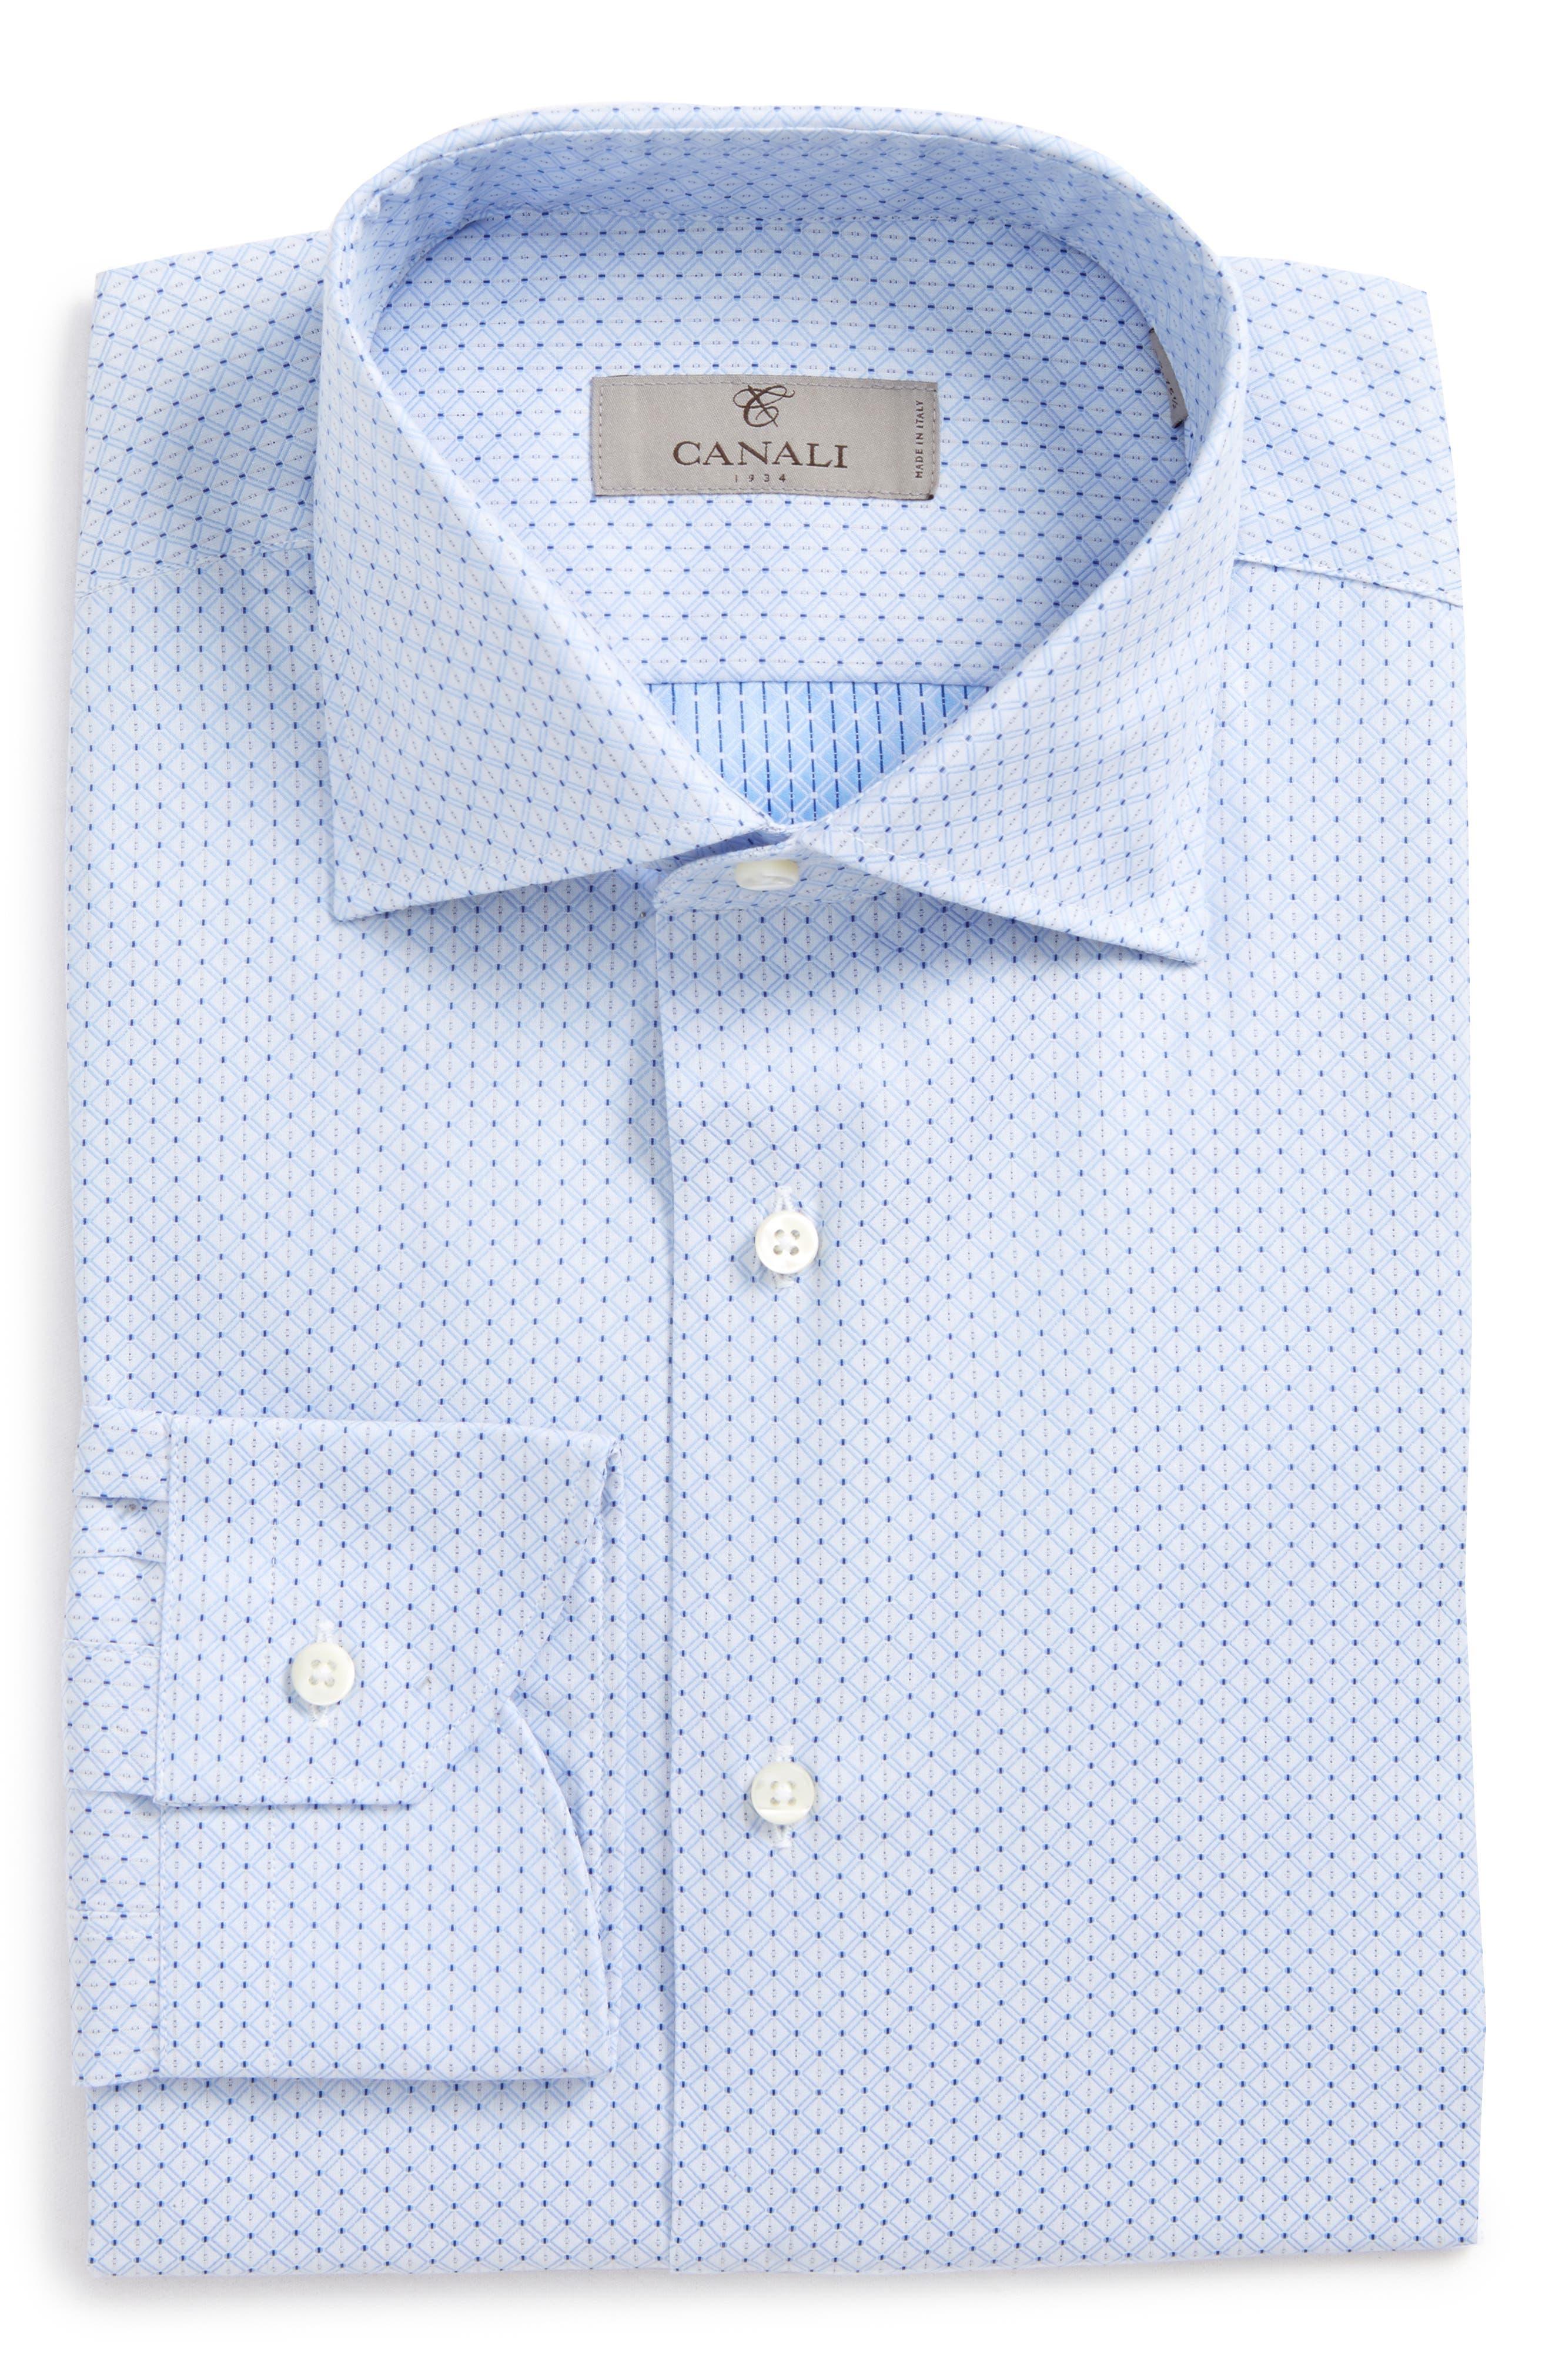 Regular Fit Geometric Dress Shirt,                             Main thumbnail 1, color,                             LIGHT BLUE